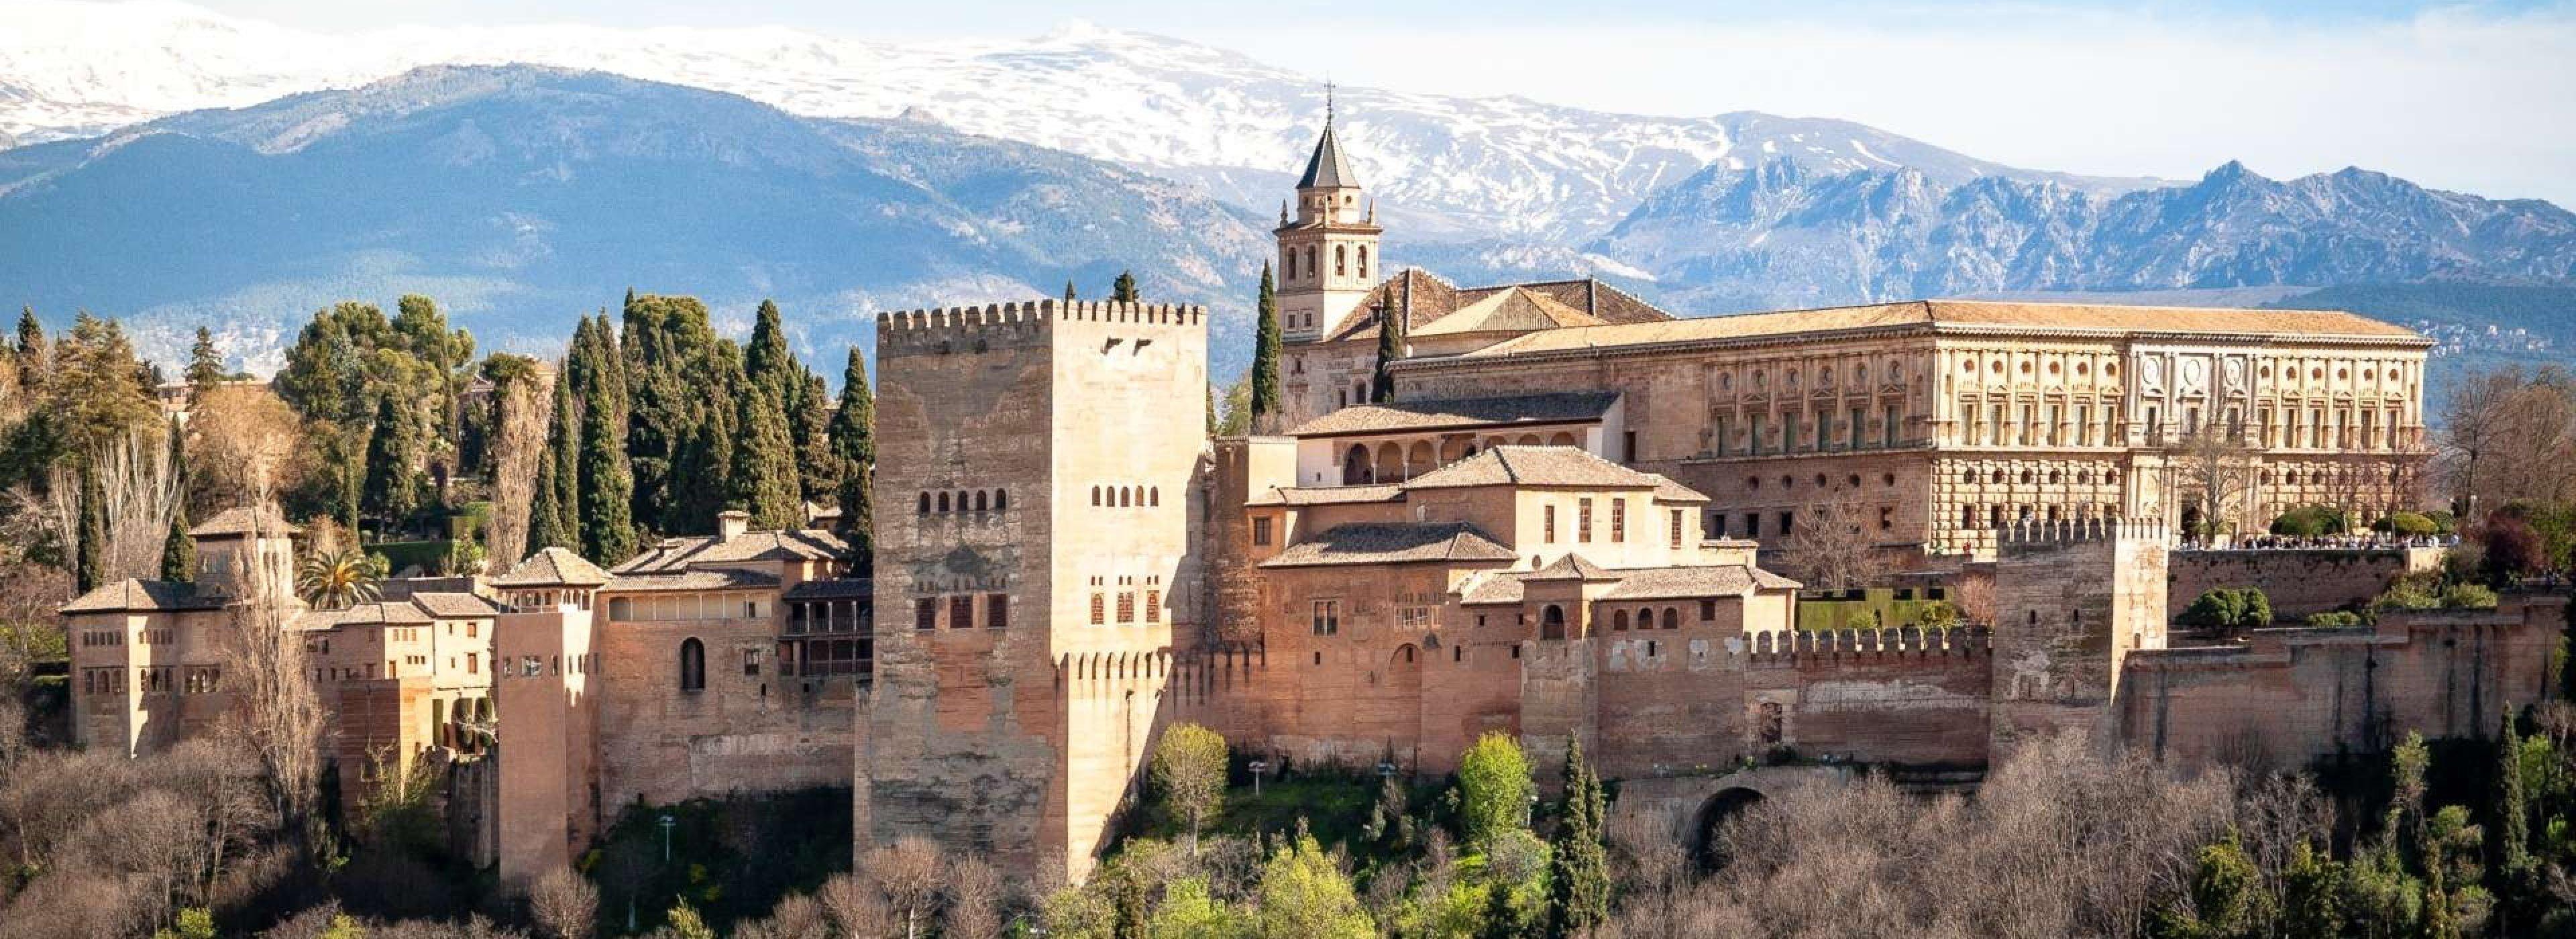 Treasures of Southern Spain